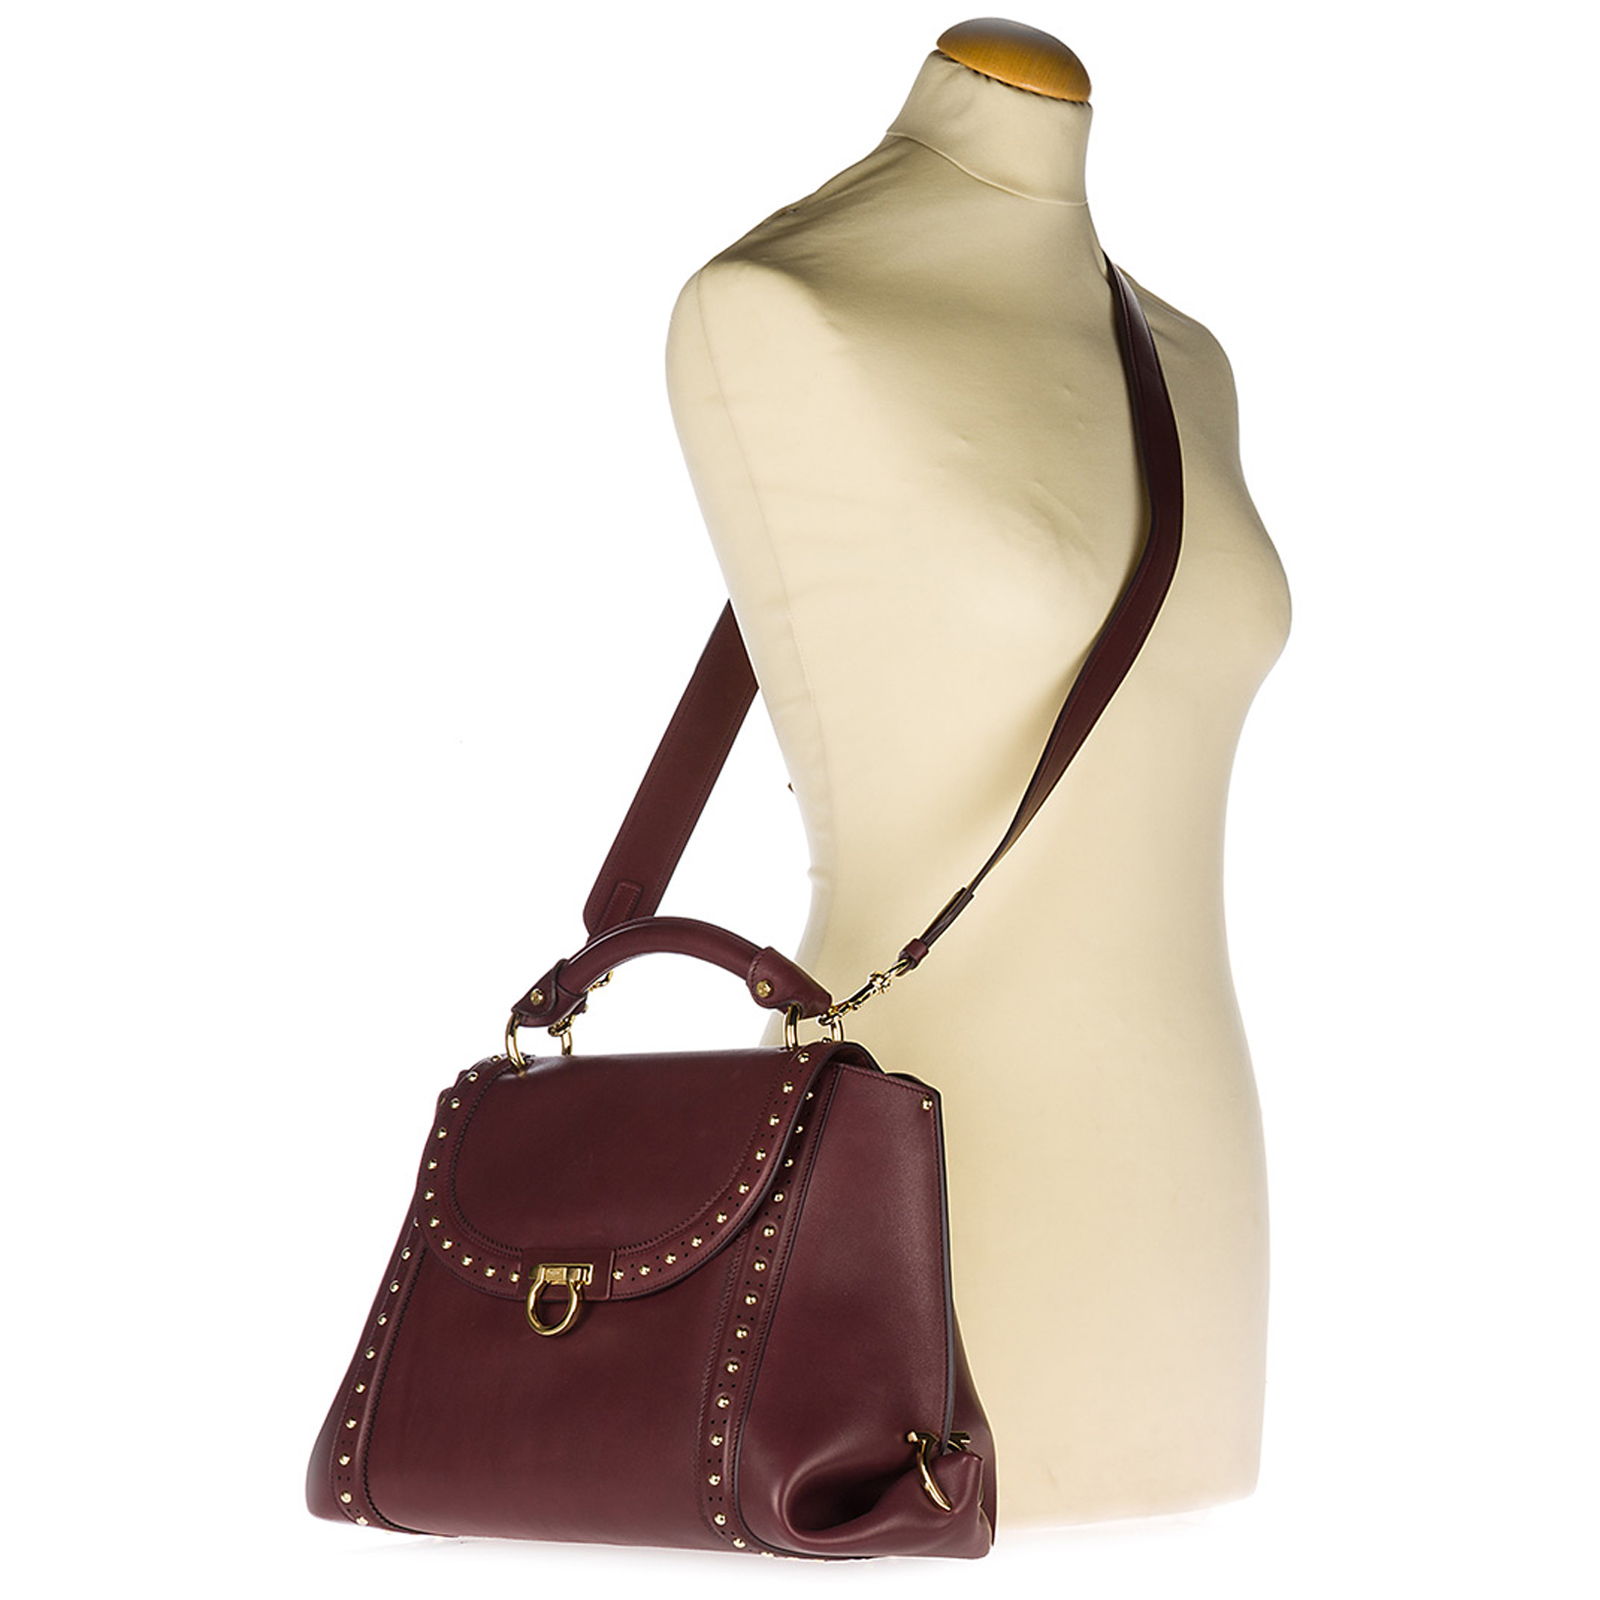 f4dbc7a7b0 Handbag Salvatore Ferragamo Sofia 21G805 681061 deep bordeaux ...